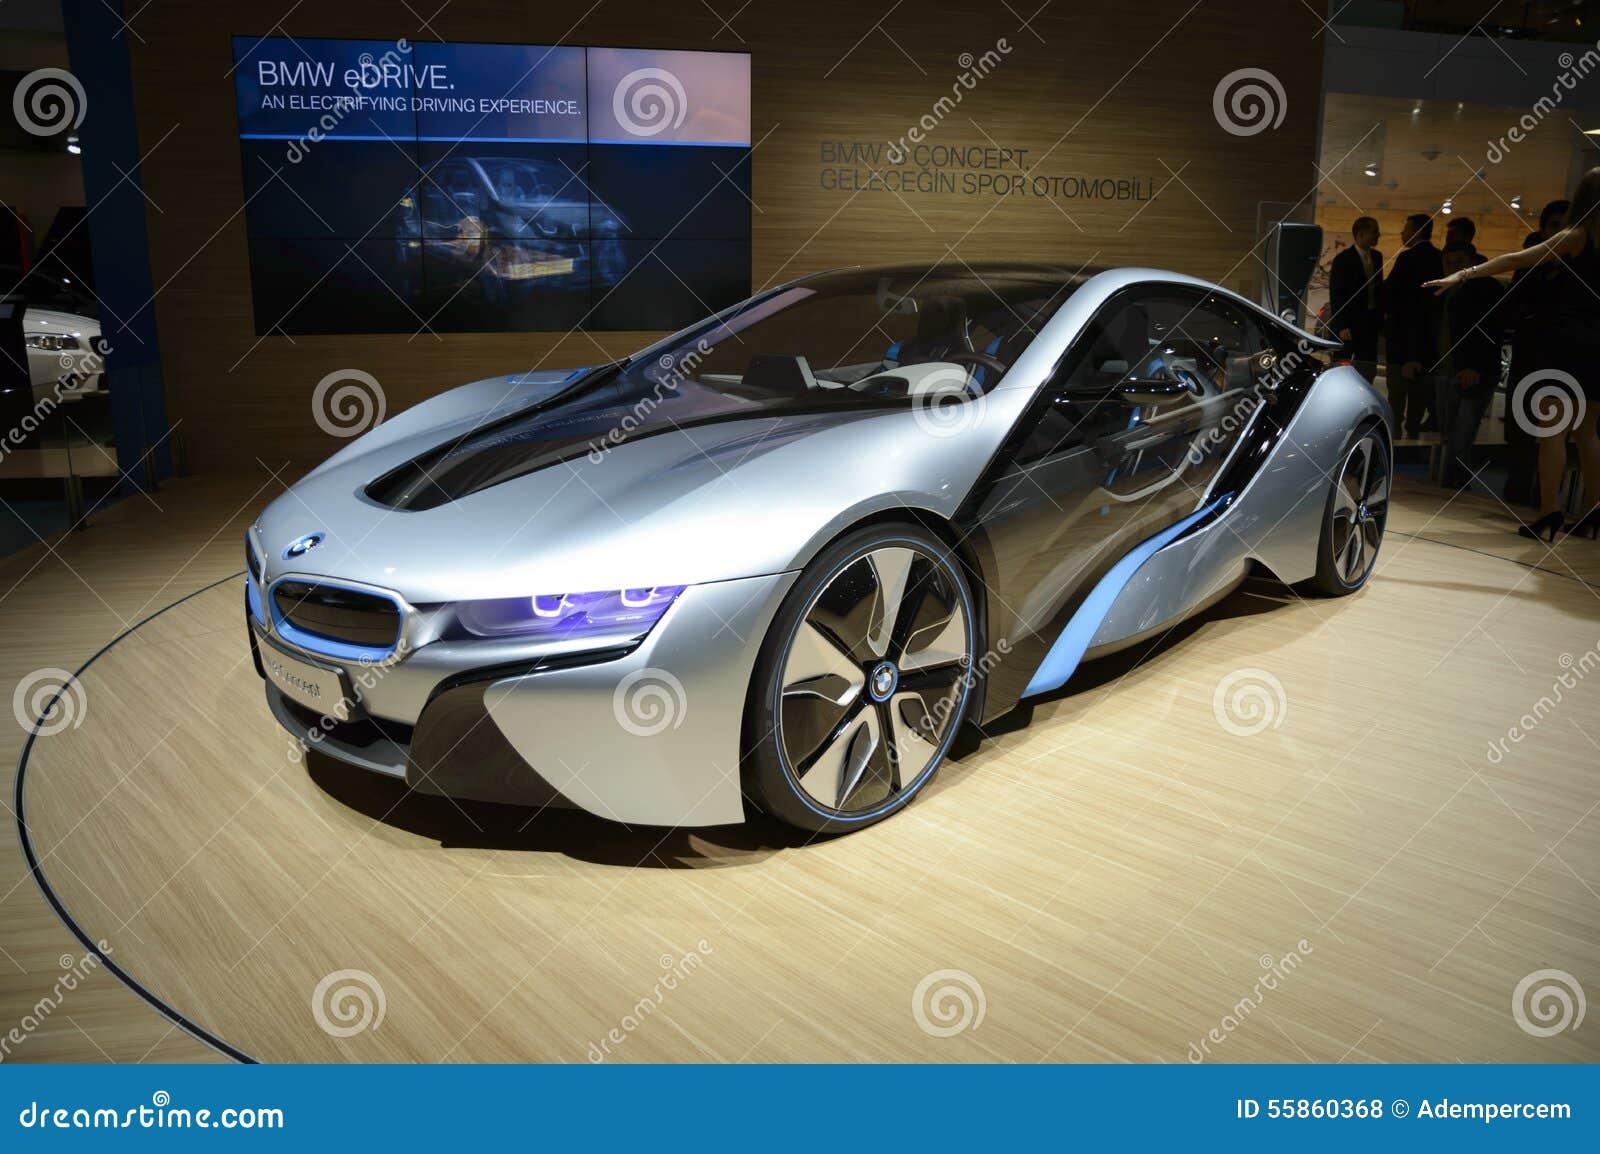 Bmw I8 Vision Efficient Dynamics Hybrid Car Editorial Stock Photo